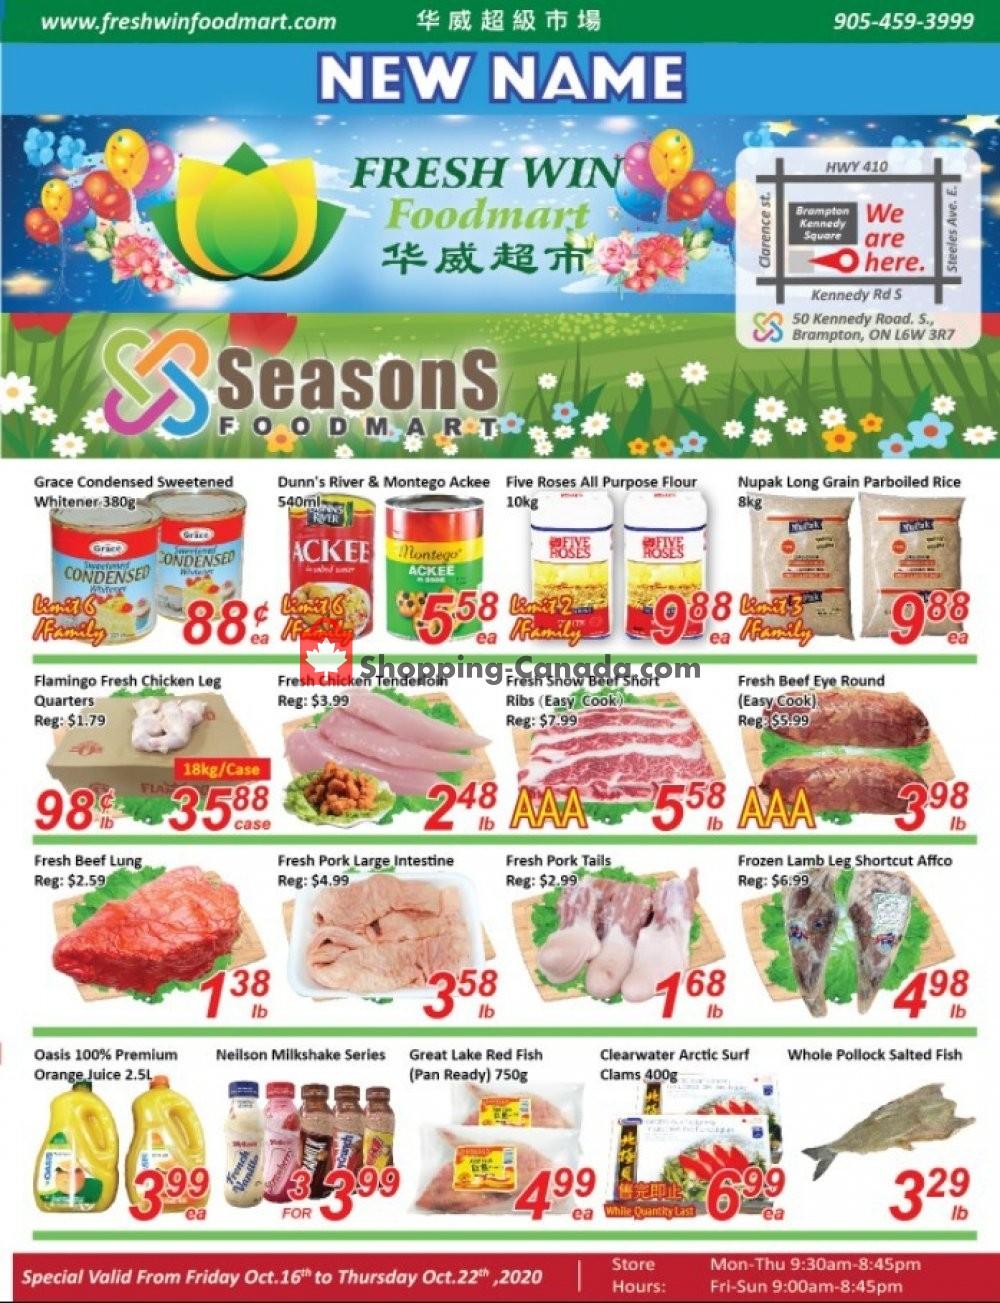 Flyer Seasons Food Mart Canada - from Friday October 16, 2020 to Thursday October 22, 2020